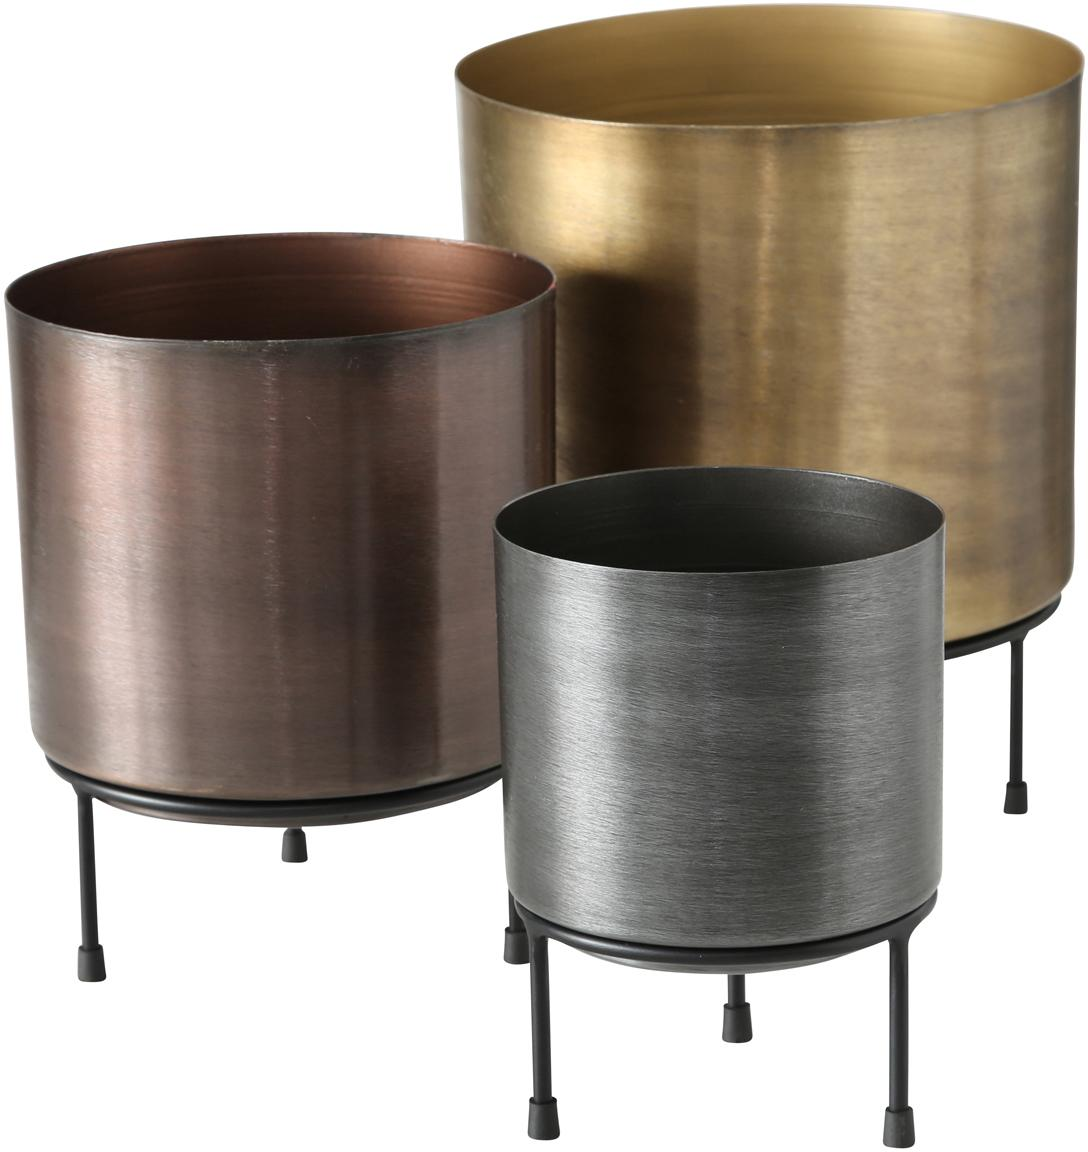 Übertopf-Set Dean aus Metall, 3-tlg., Metall, Mehrfarbig, Sondergrößen